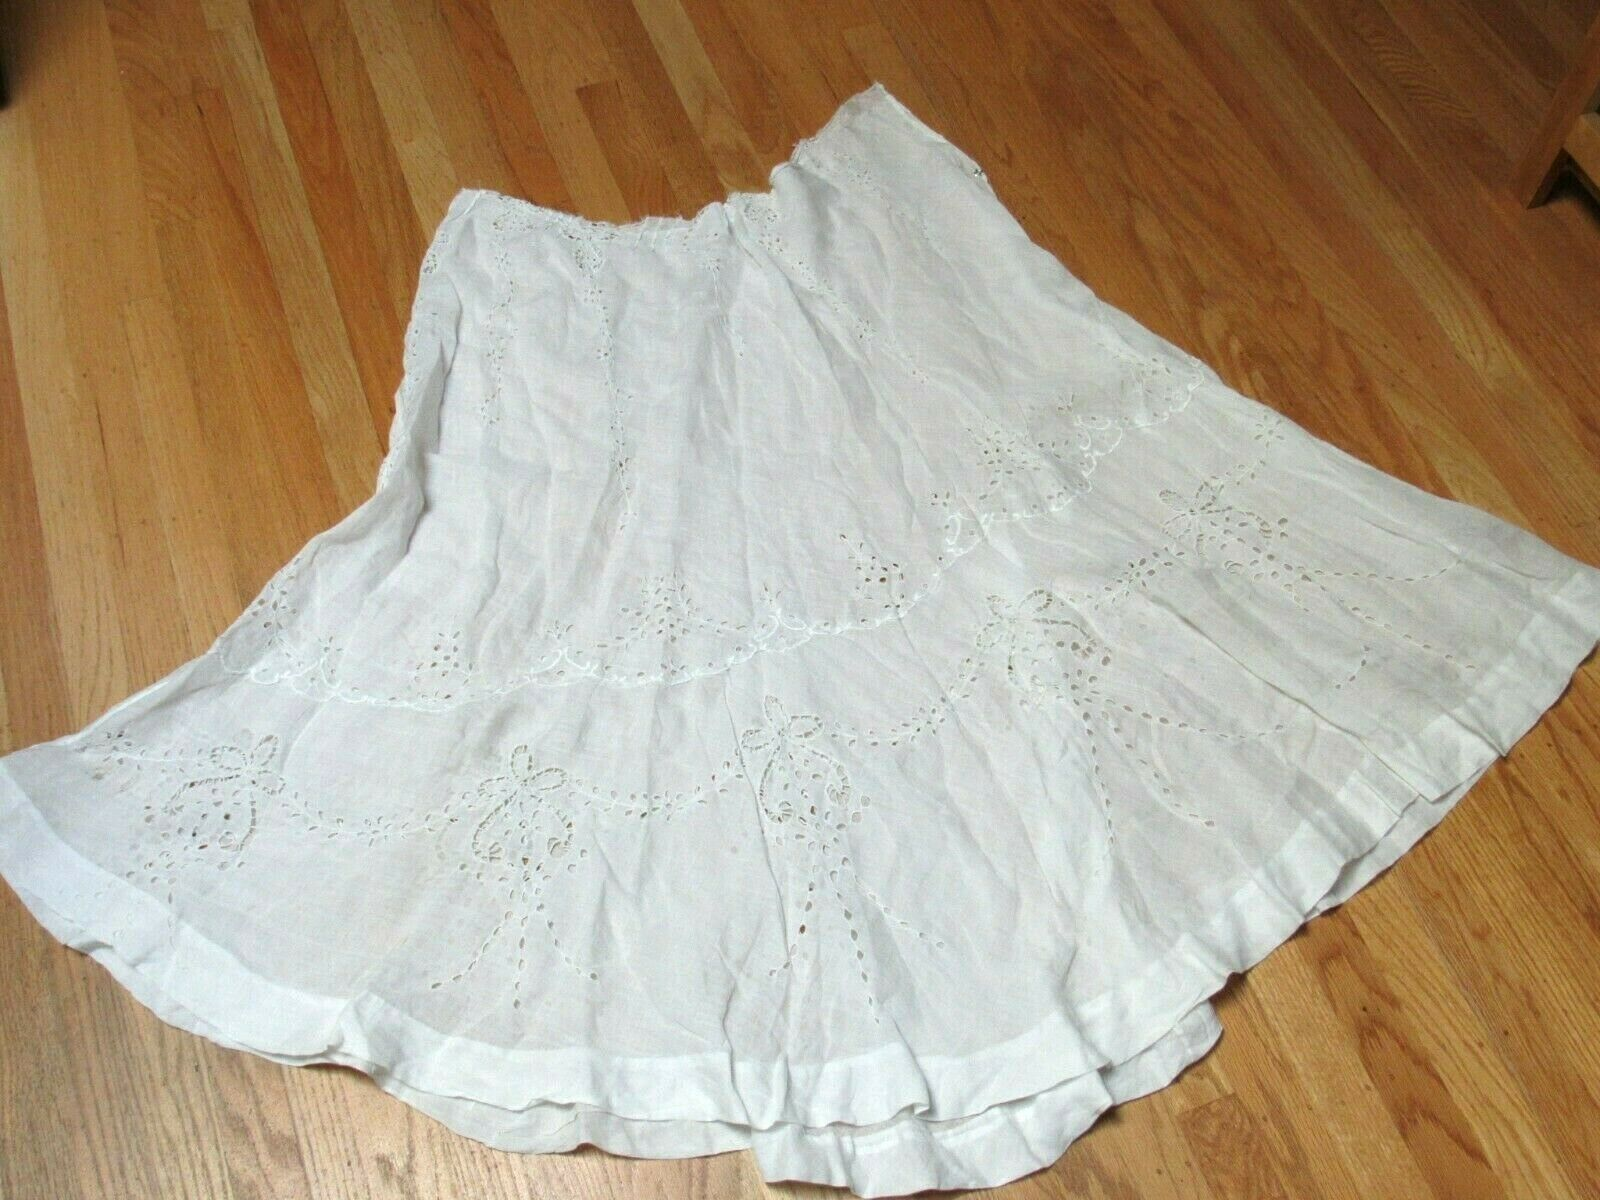 Antique Victorian White CottonPetticoat Slip Skirt Eyelet Needs Waistband Great!